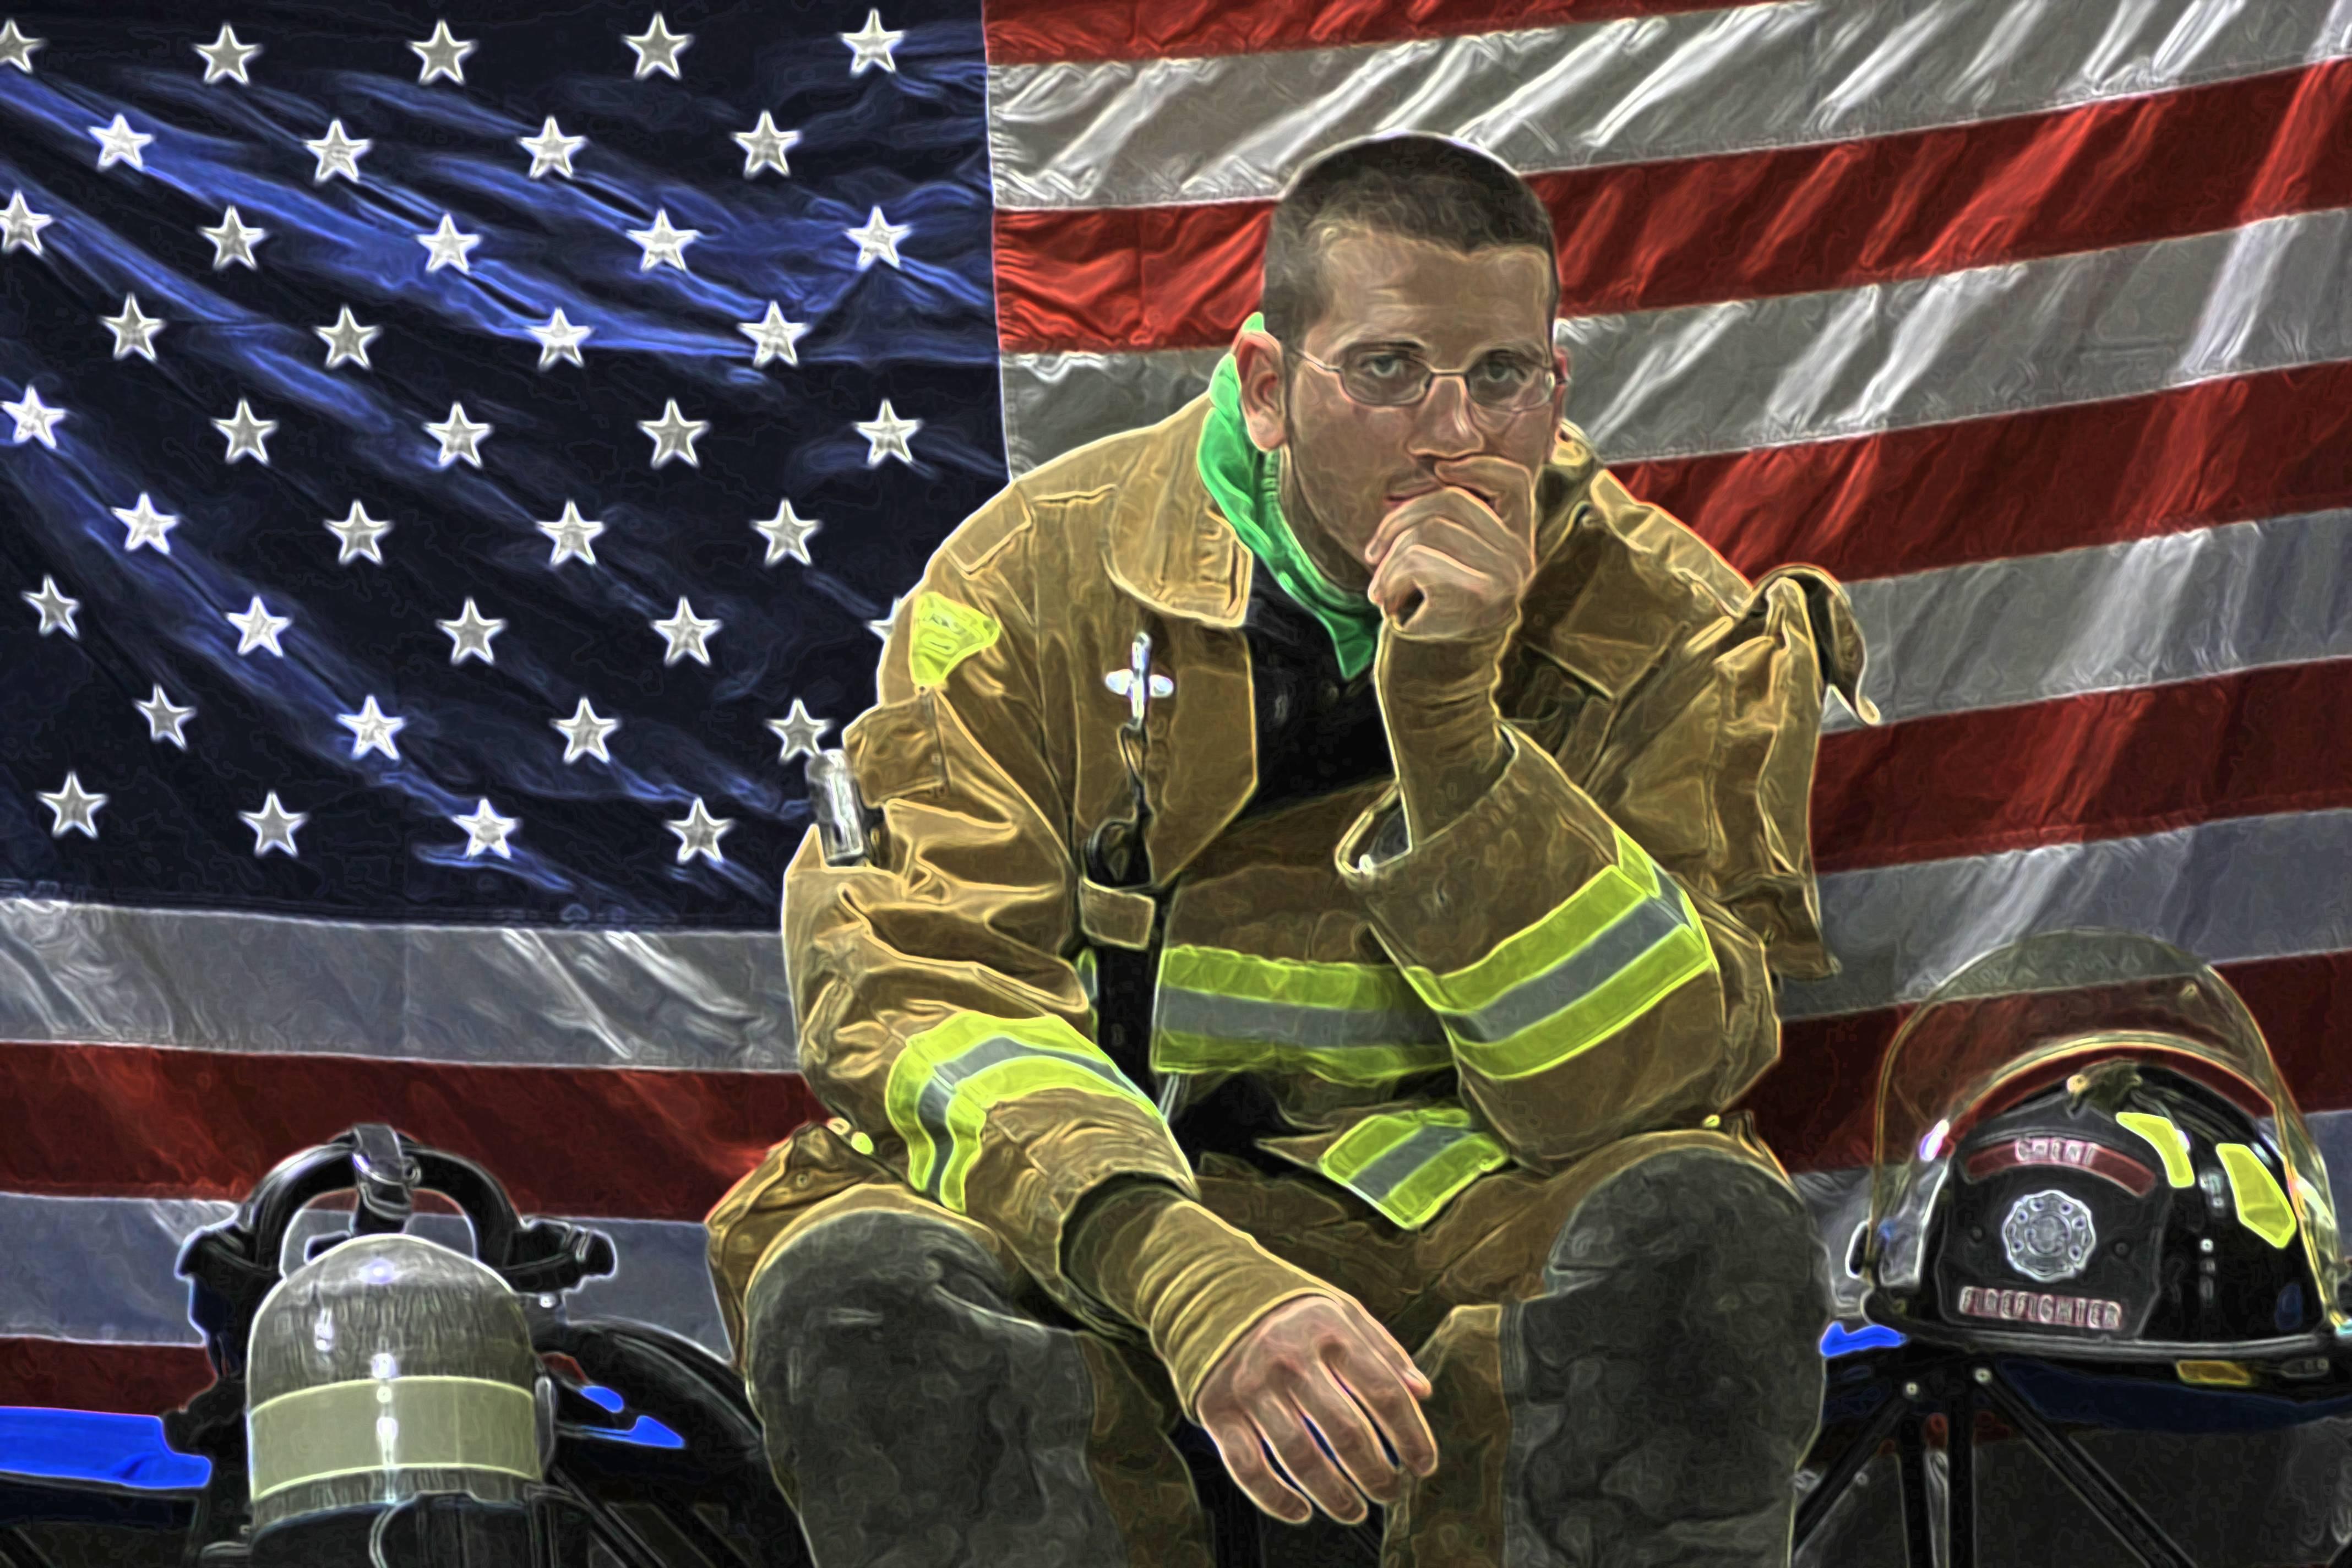 Biker Wallpaper Quotes Firefighter Backgrounds Wallpaper Cave